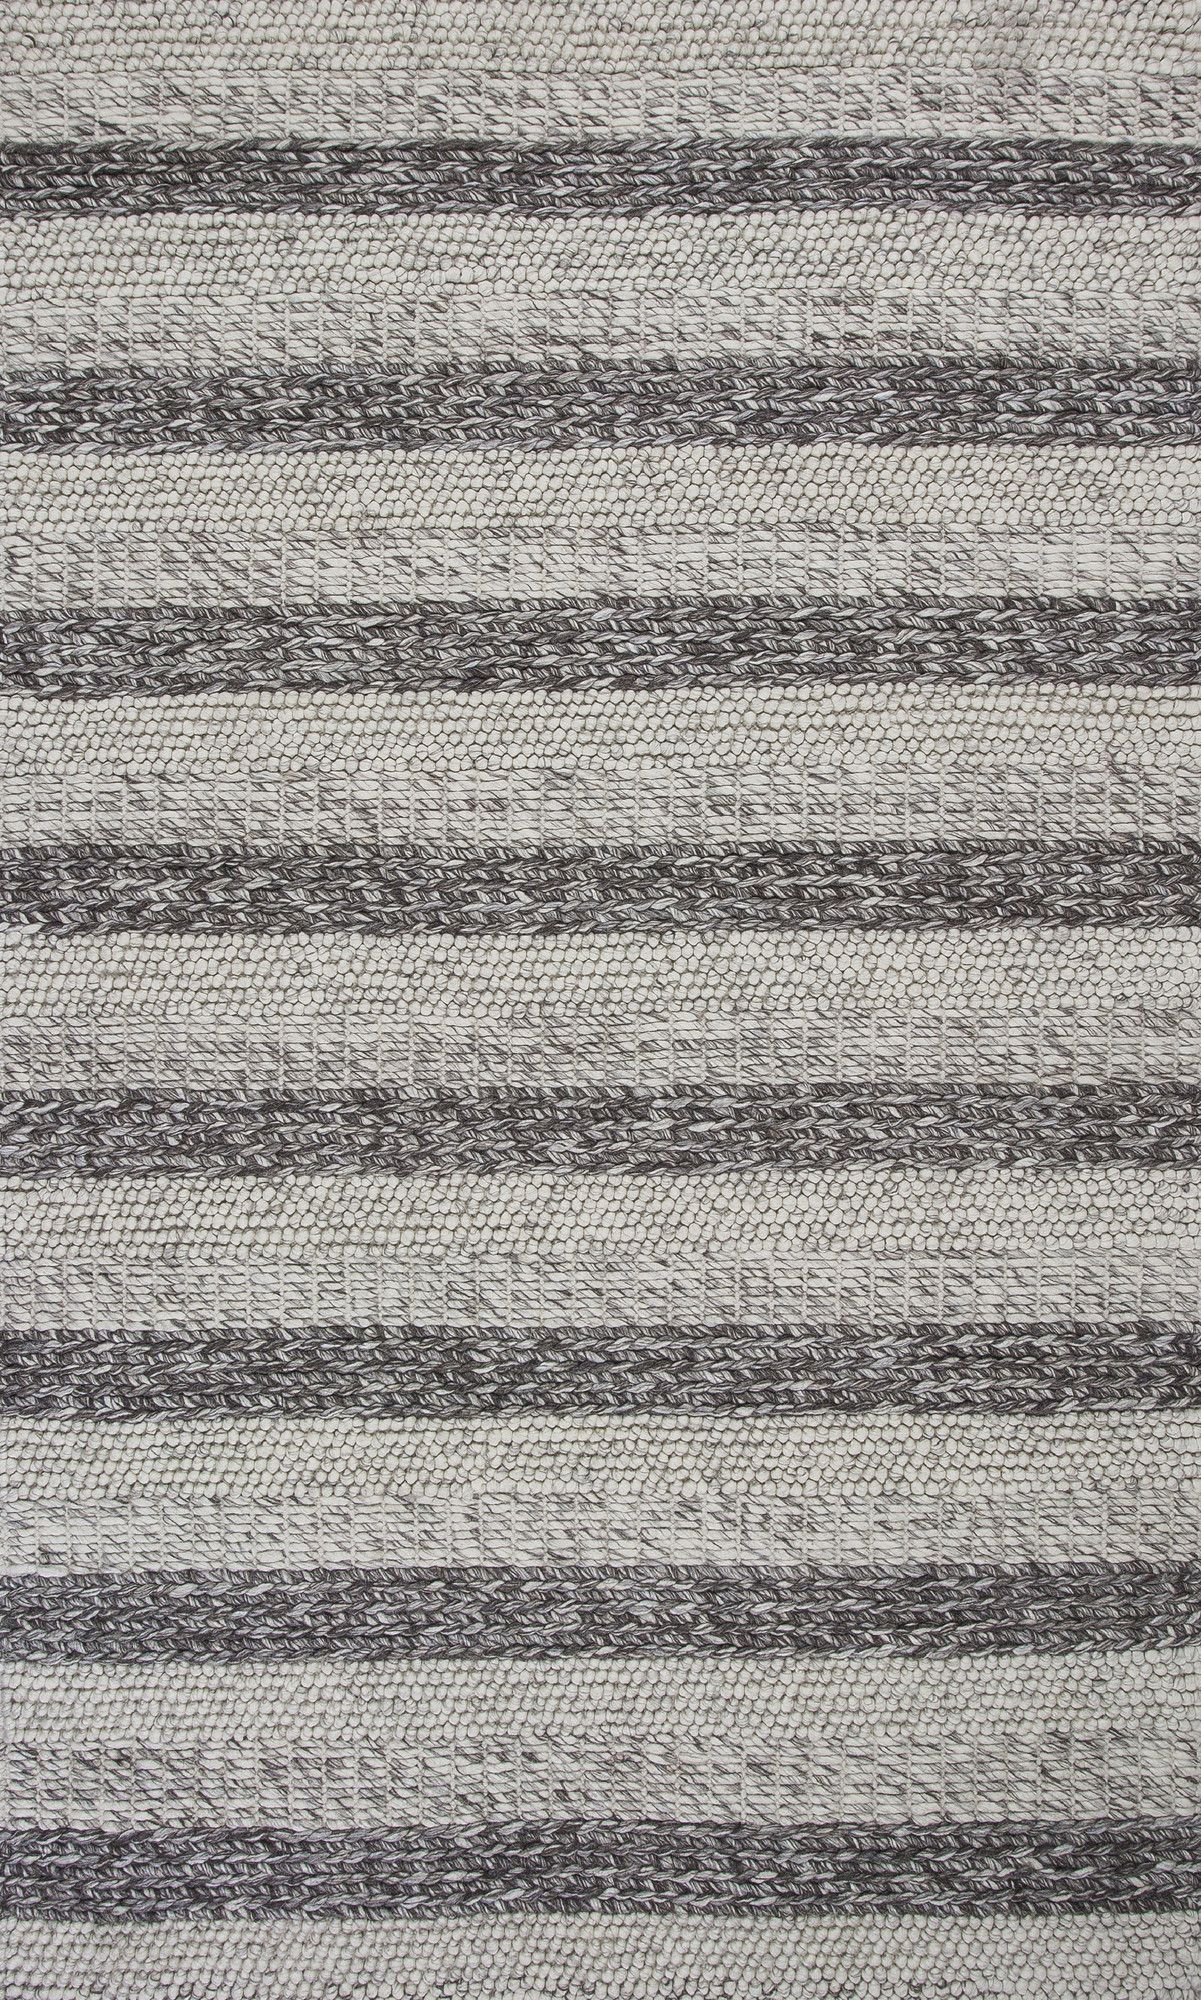 Luckey Hand-Woven Gray/White Area Rug